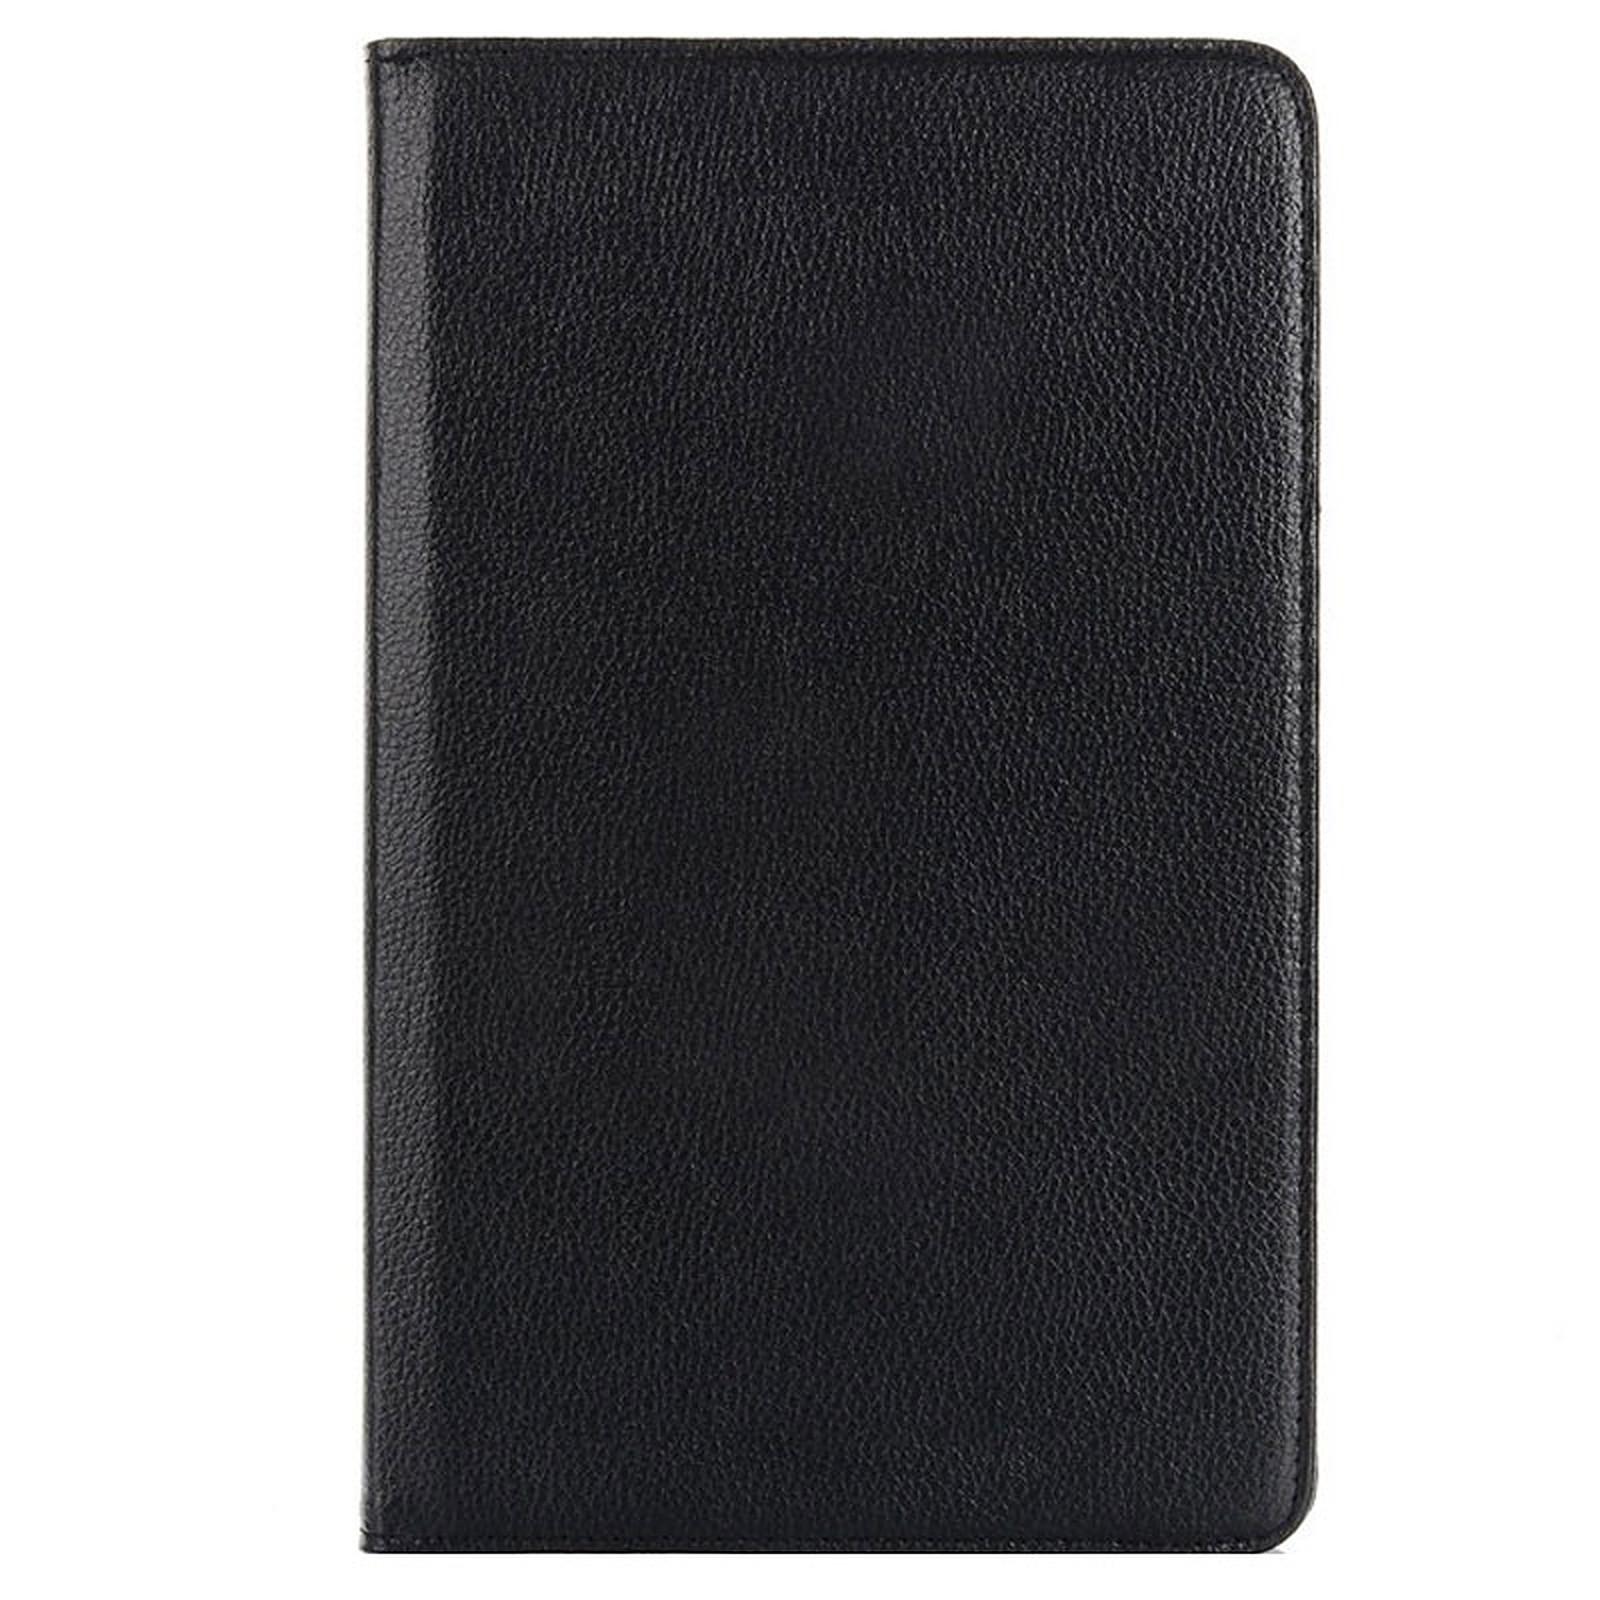 "Akashi Etui Folio Galaxy Tab S5e 10.5"" Noir"